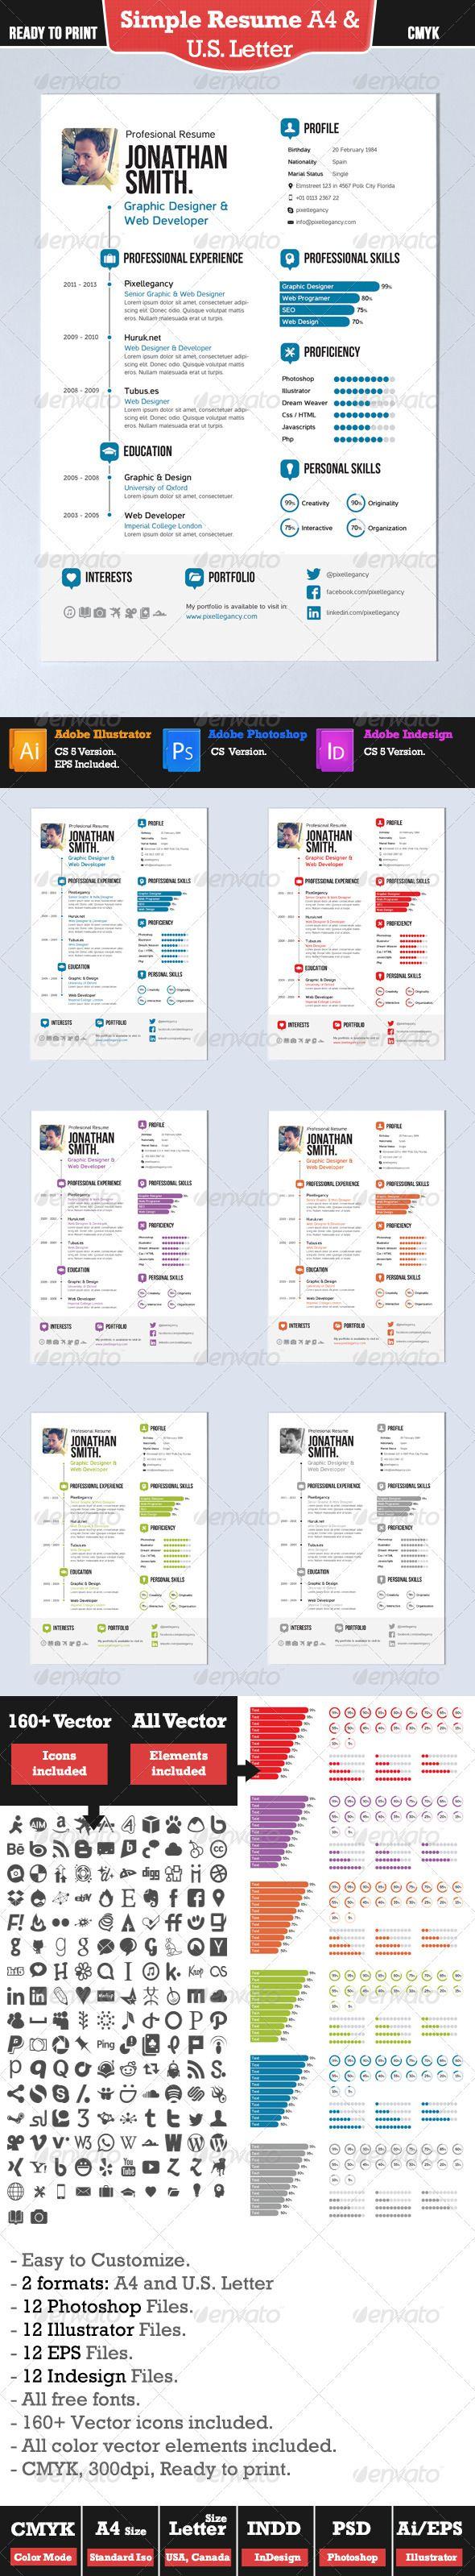 364 best cv modelos images on pinterest resume cv models and